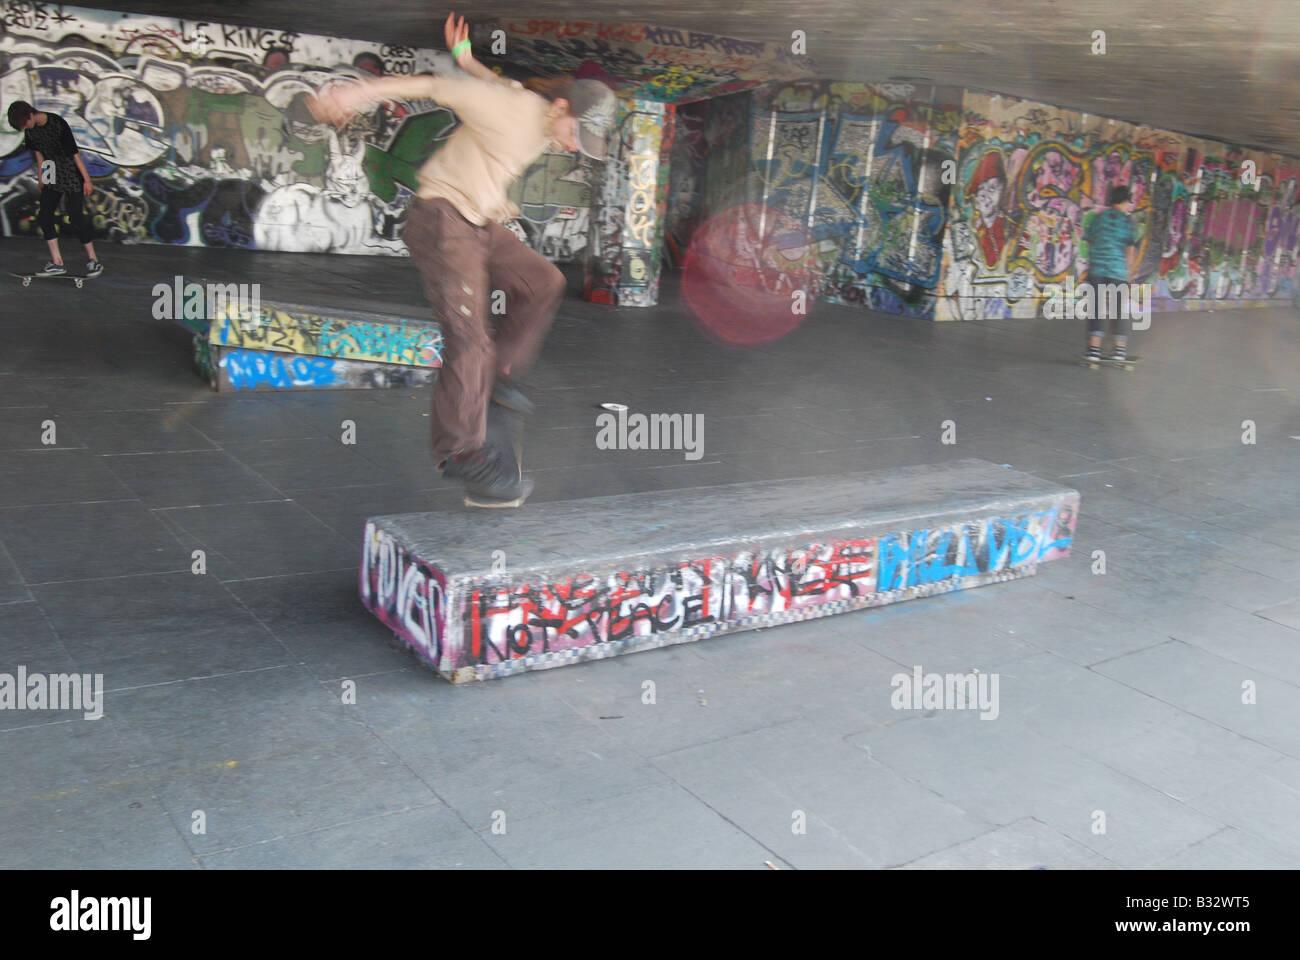 Skateboard skater Graffiti - Stock Image